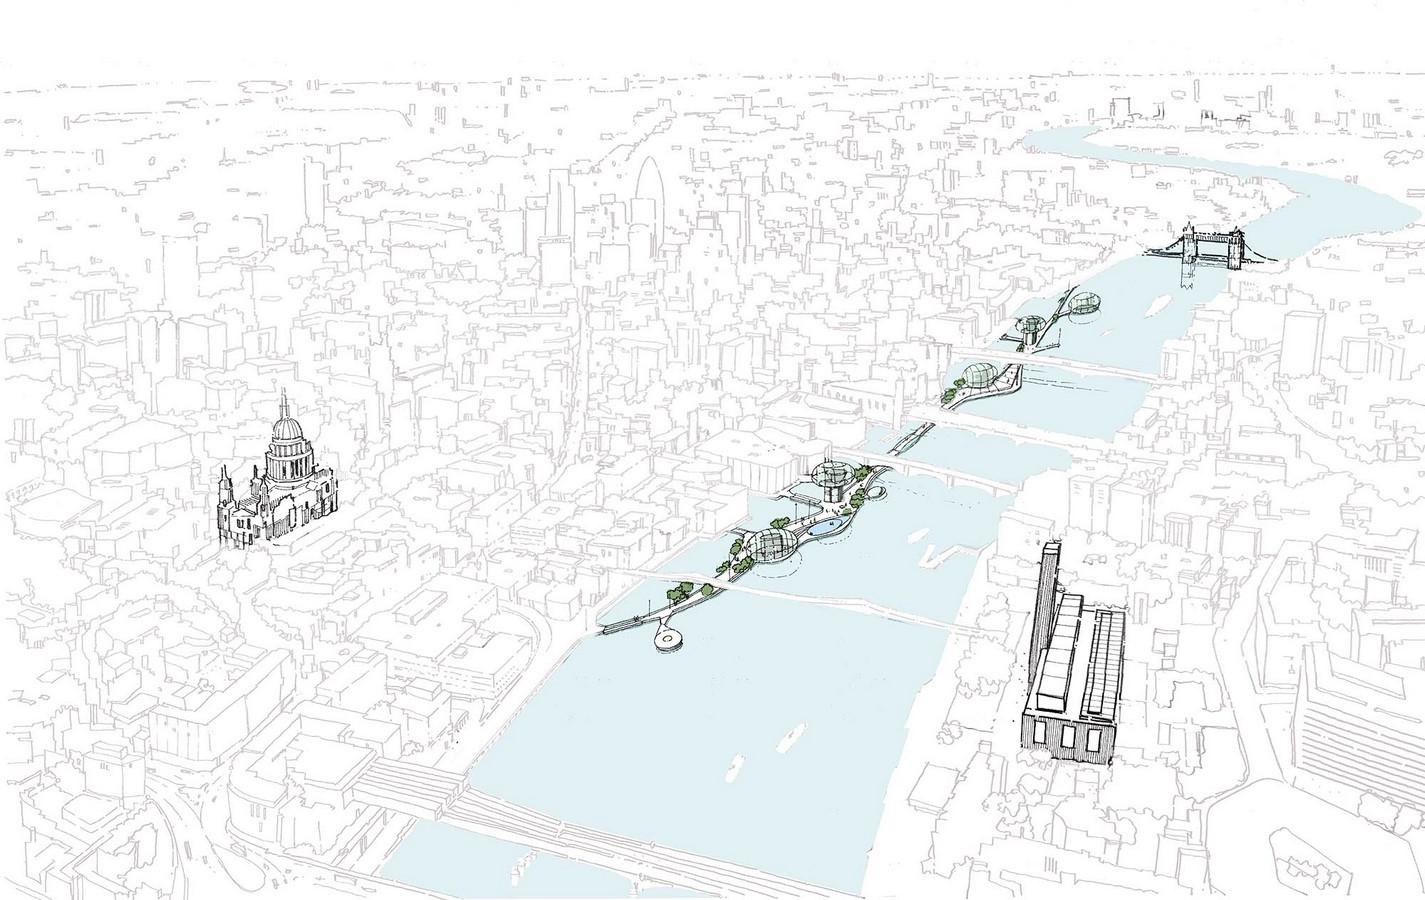 Gensler- 10 Cities & Urban Design Projects Sheet10